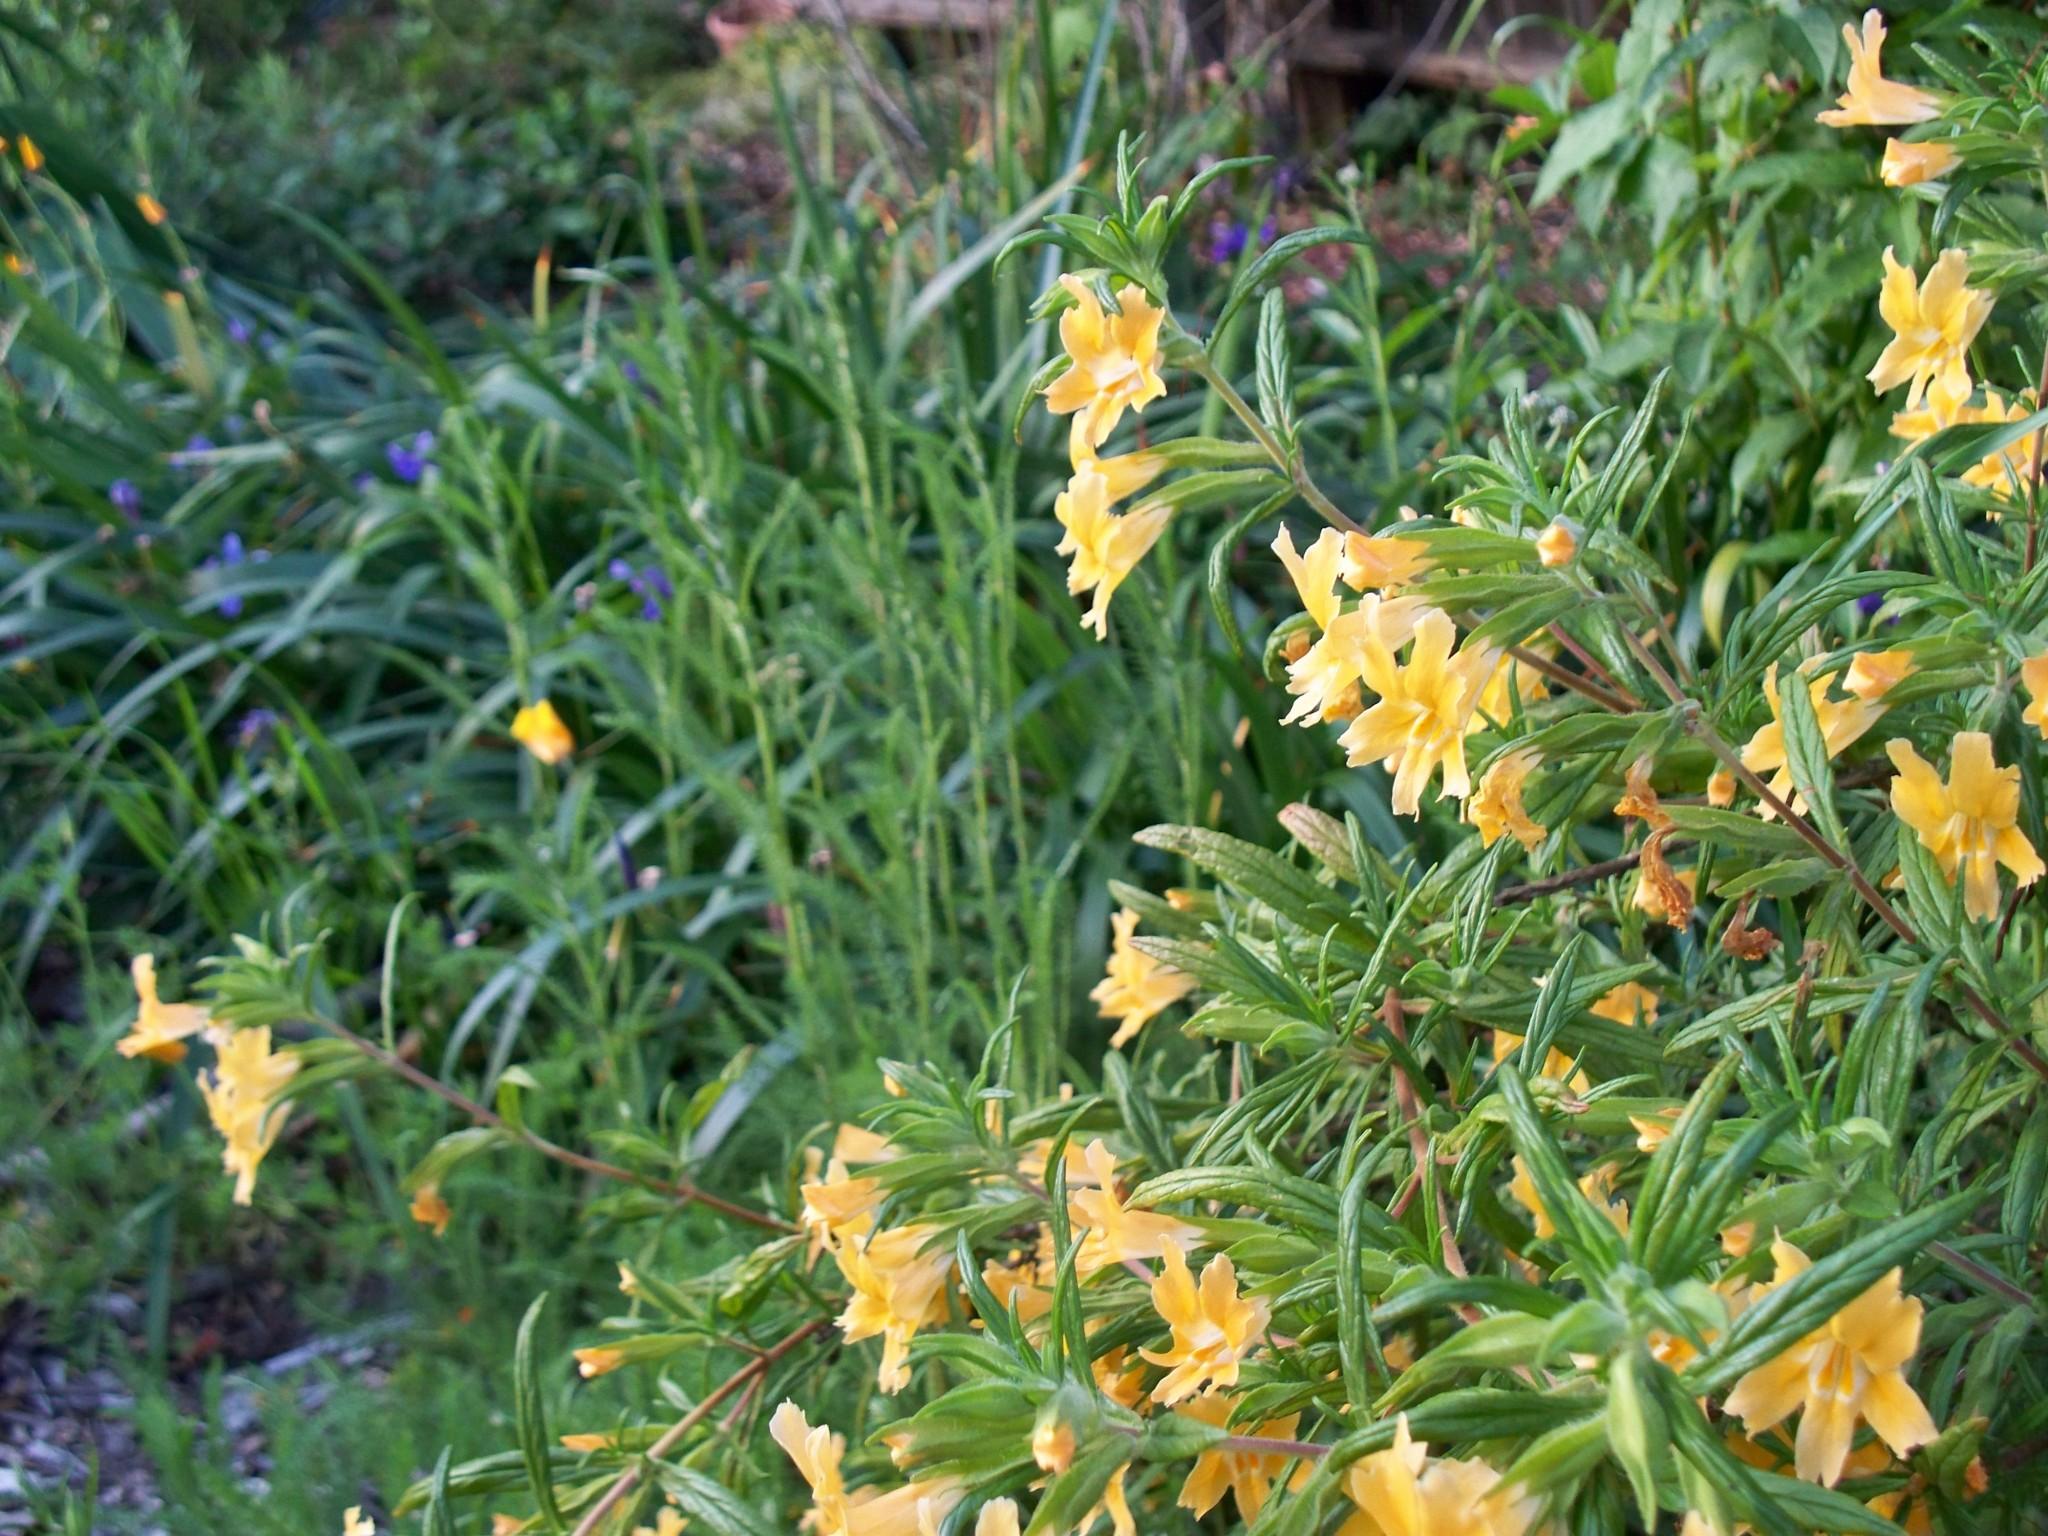 Mimulus aurantiacus – sticky monkeyflower